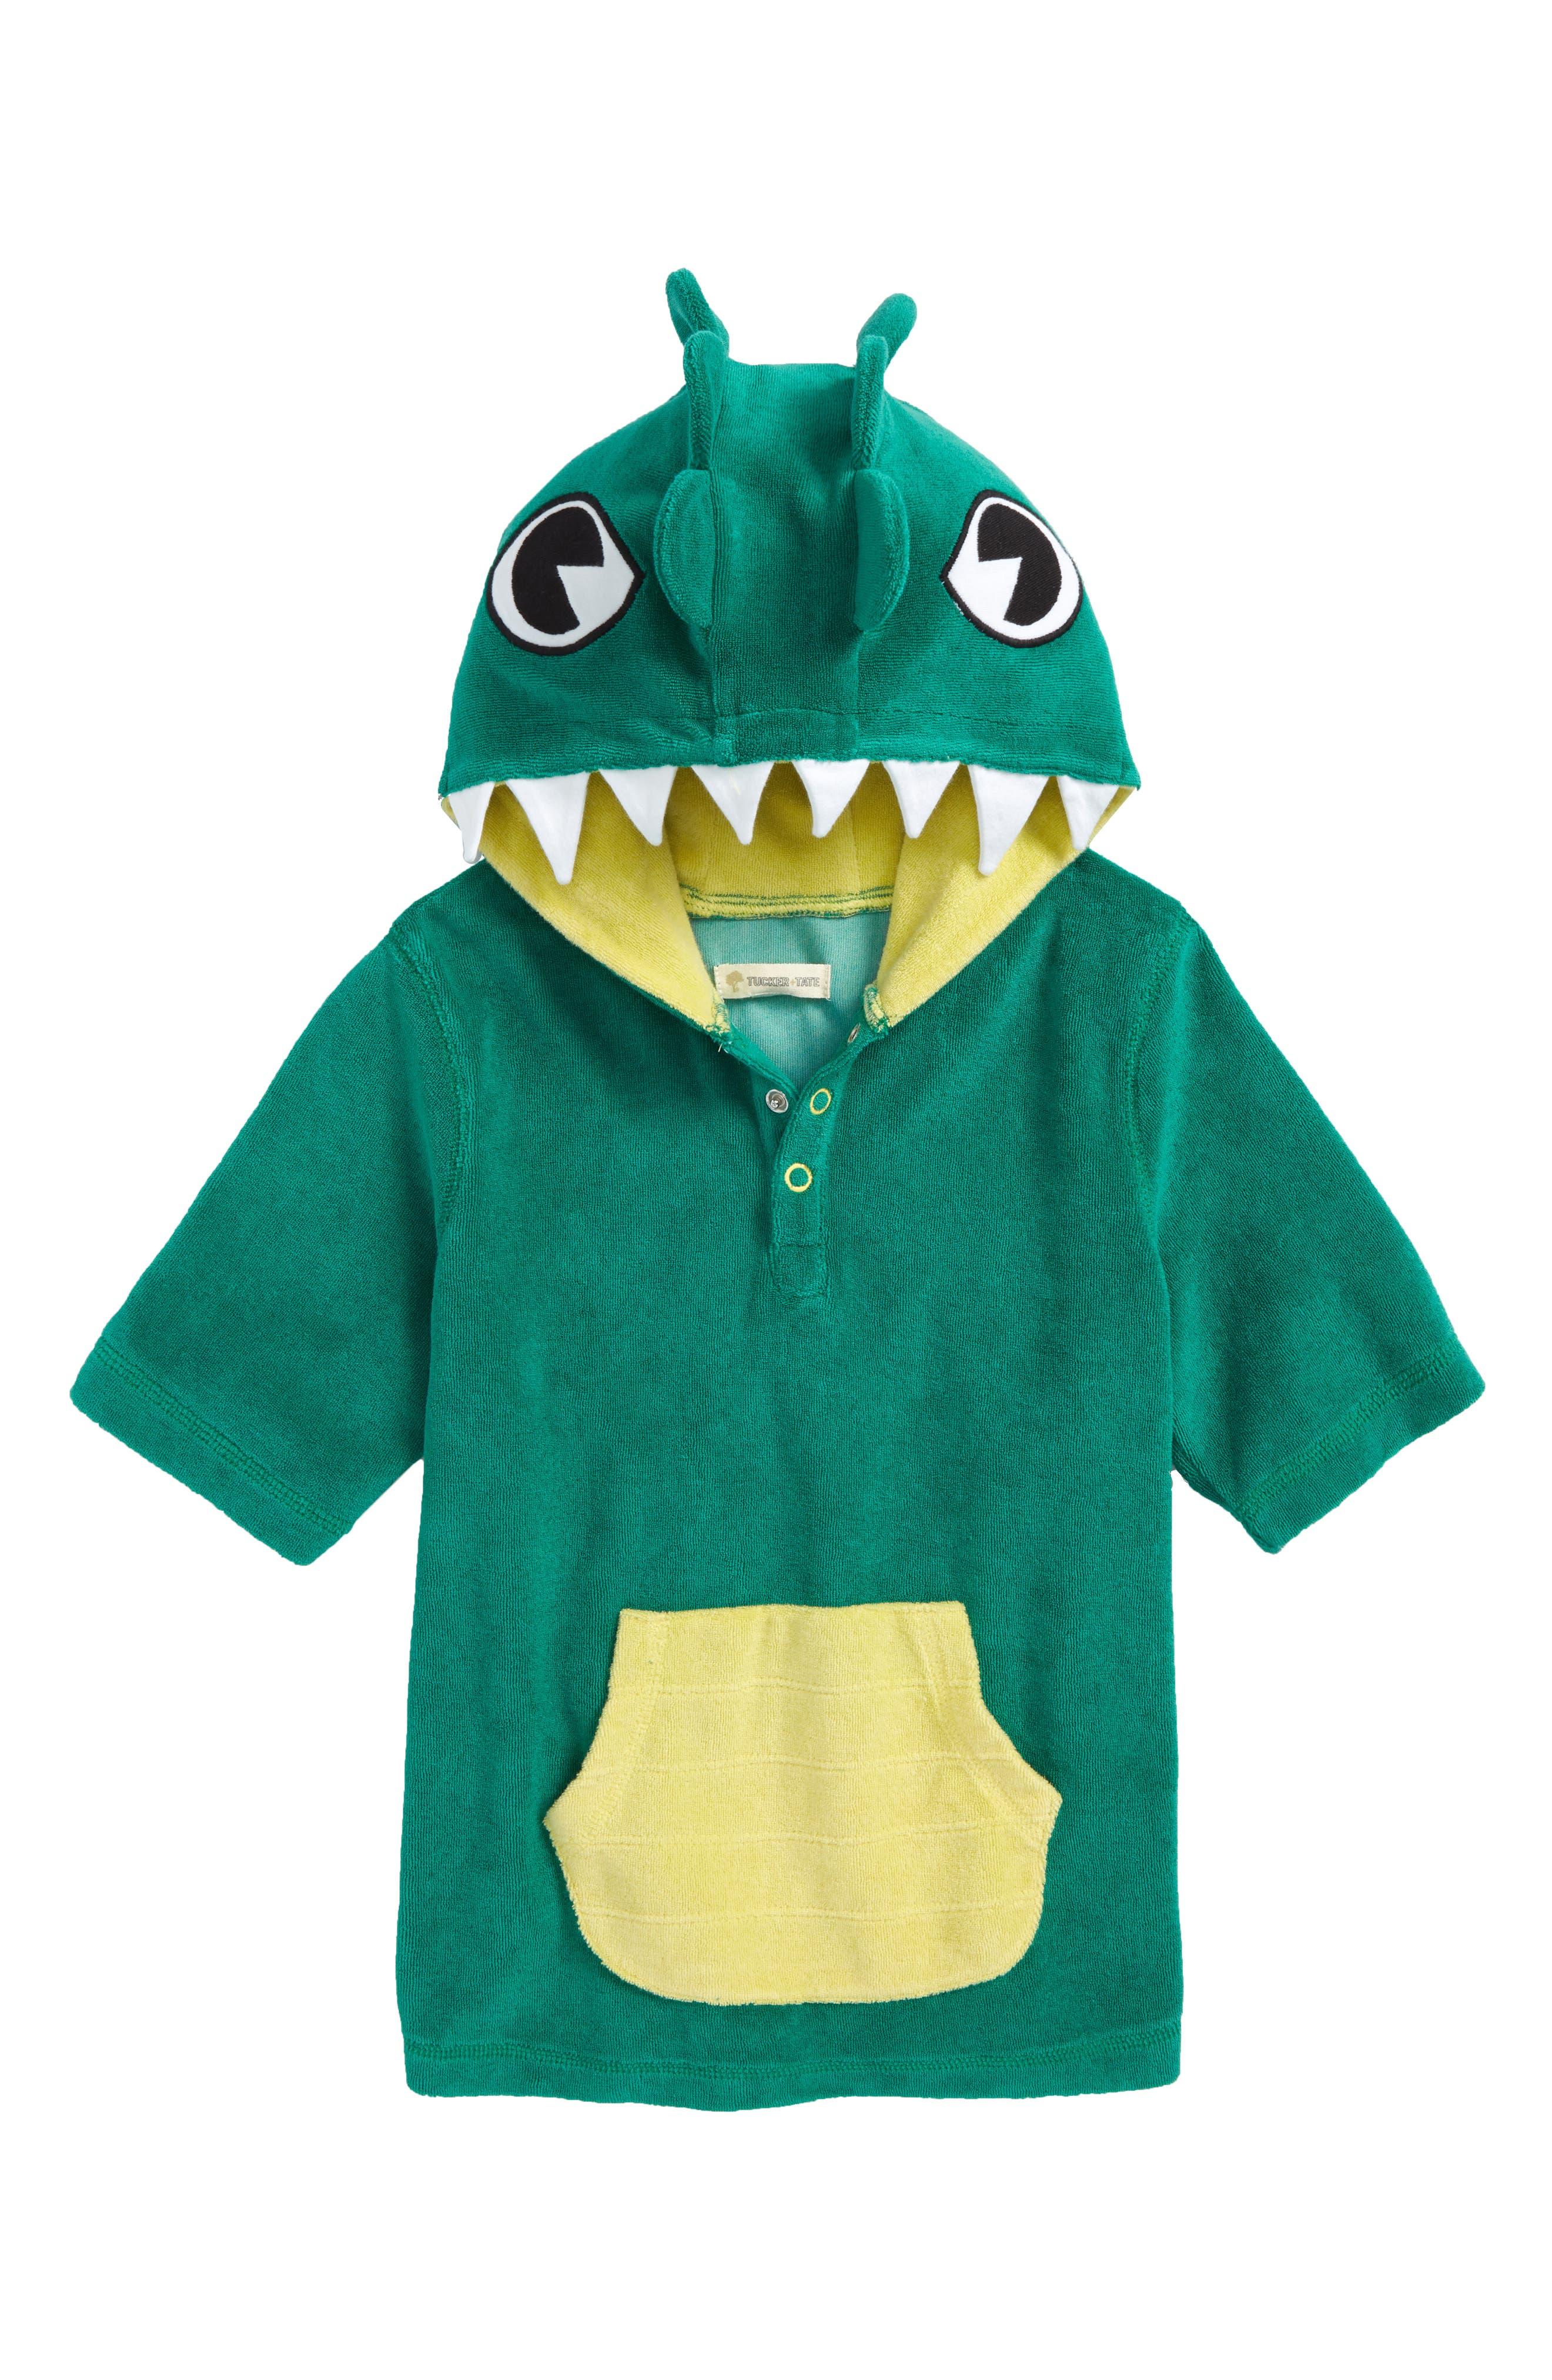 Green Lake Gator Towel Cover-Up,                         Main,                         color, Green Lake Gator